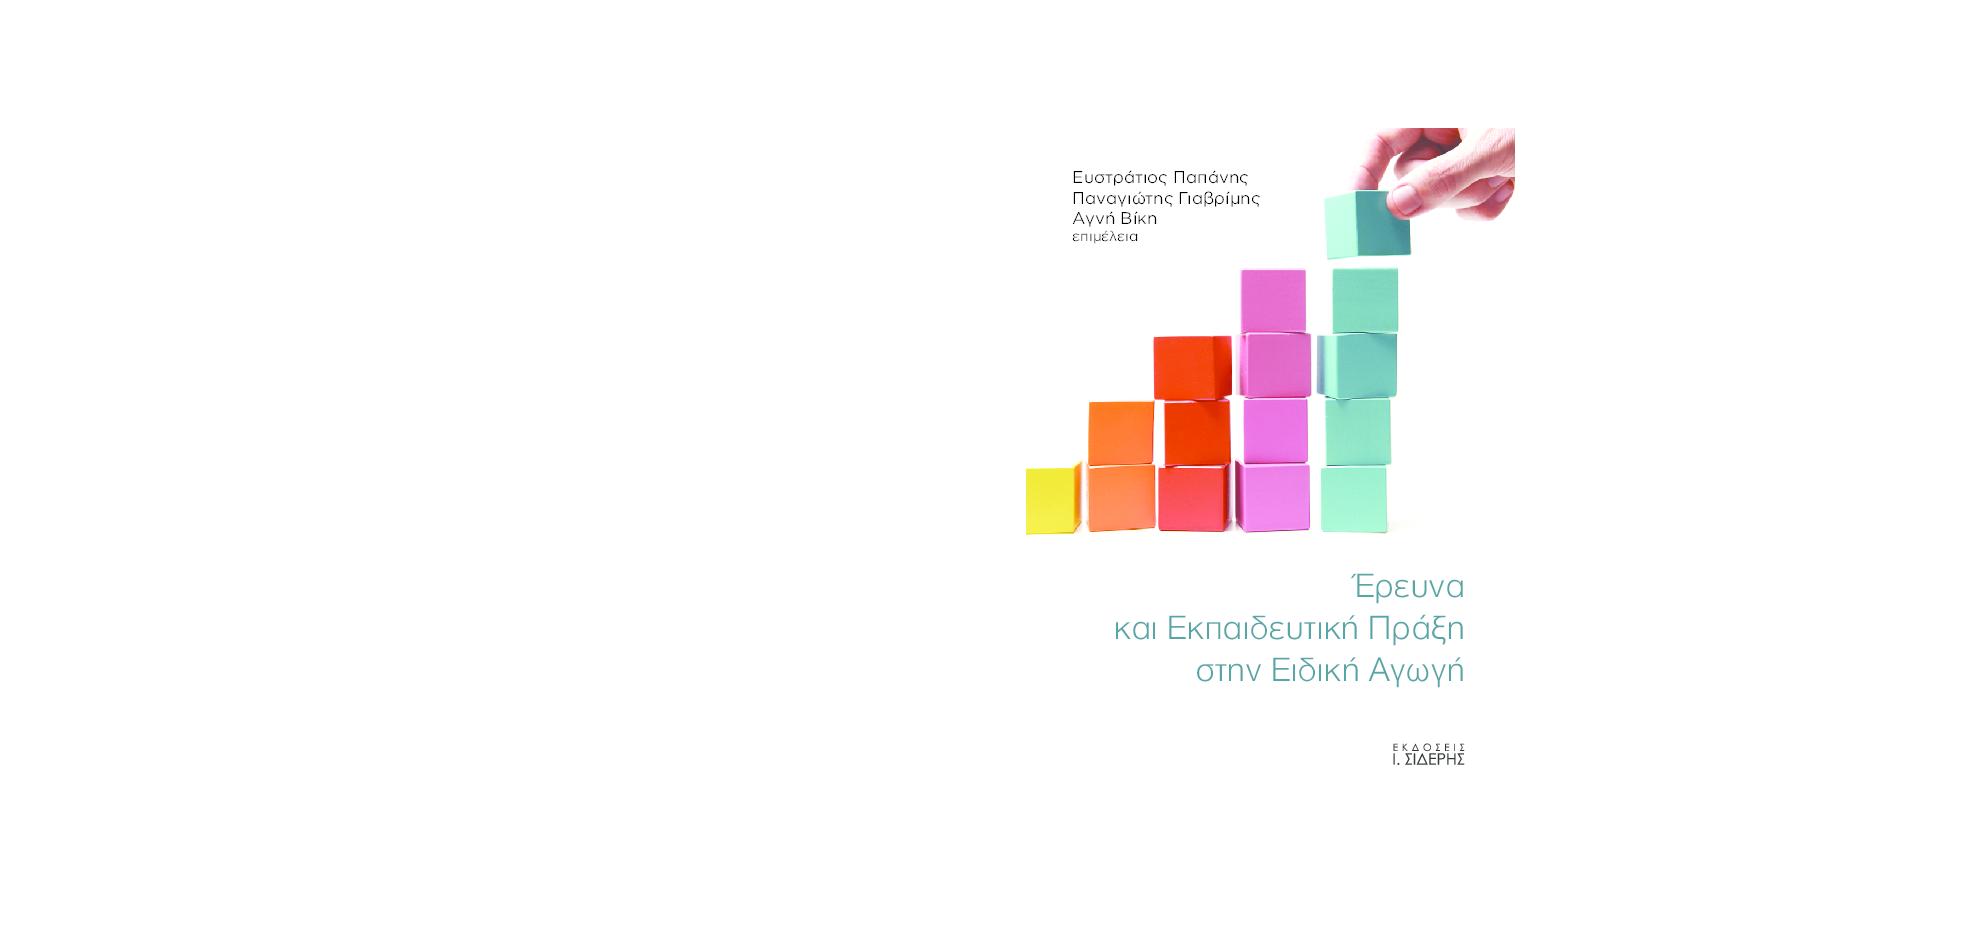 8a4ca201a90d PDF) Έρευνα και Εκπαιδευτική Πράξη στην Ειδική Αγωγή